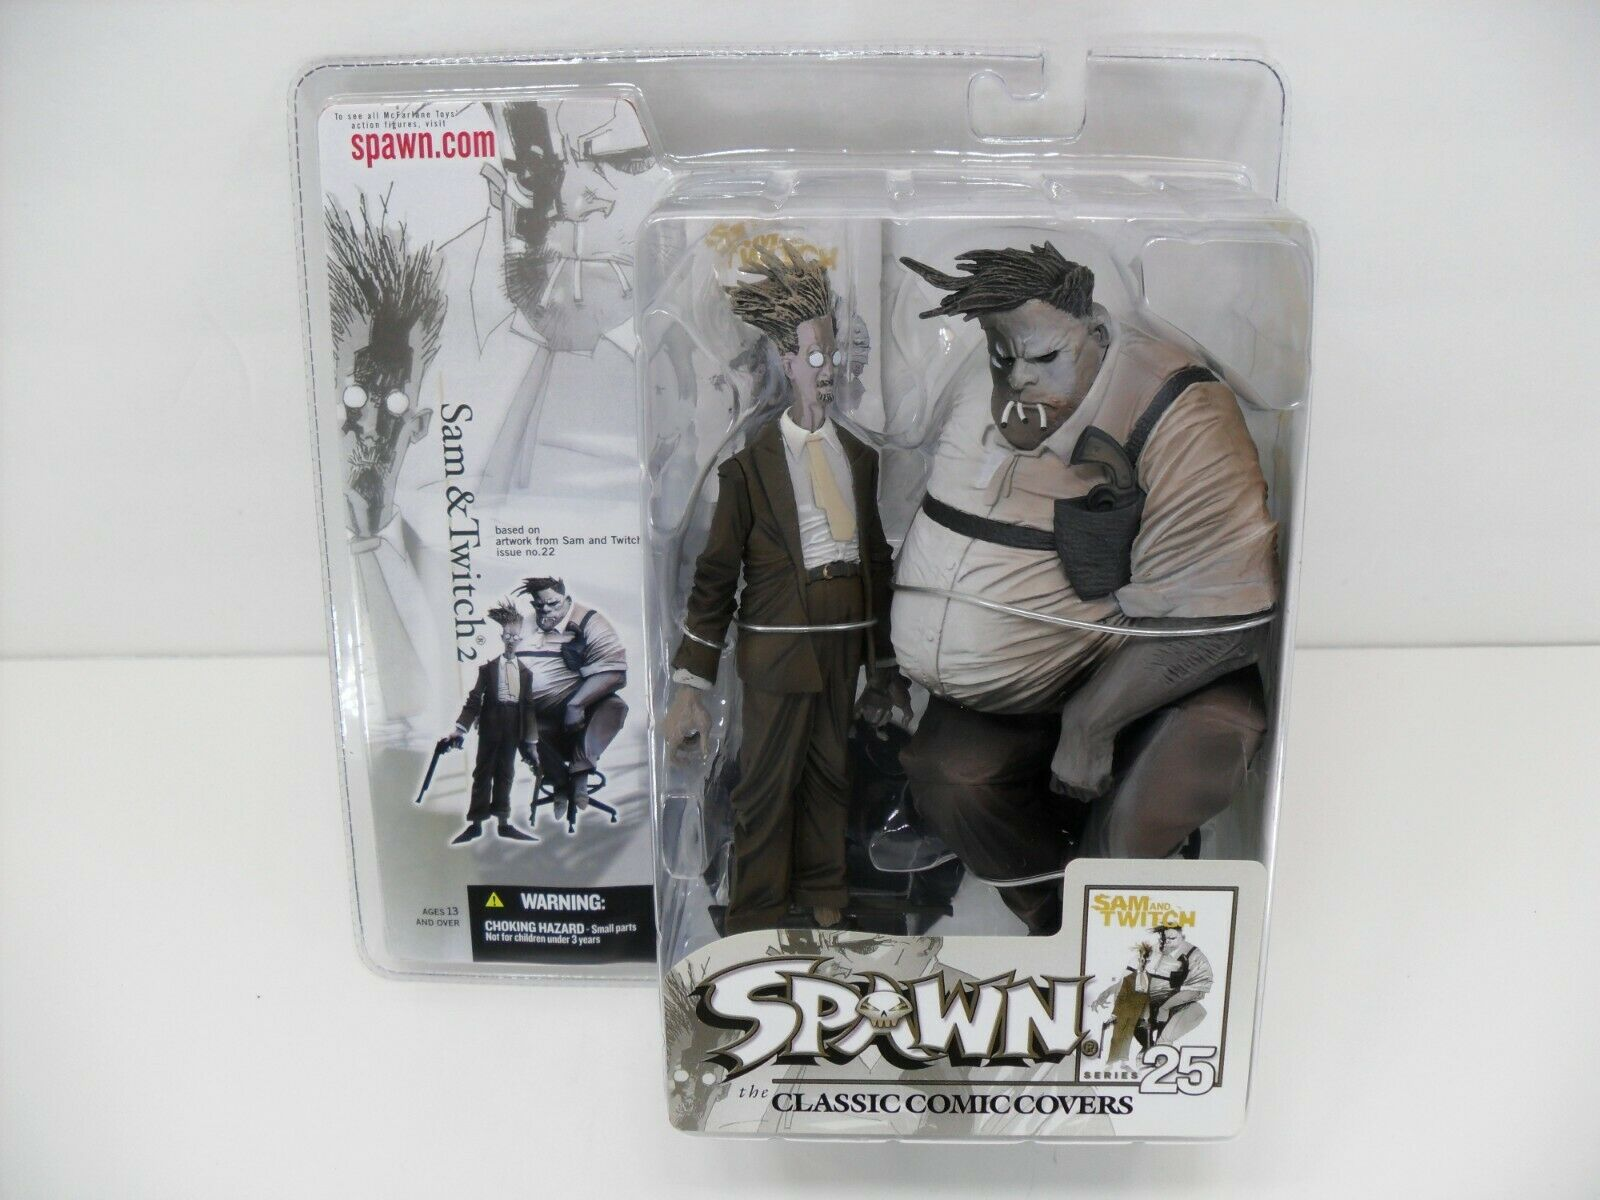 2004 McFarlane Spawn Classic Comic Covers Series 25  Sam & Twitch 2  i.22 Figure